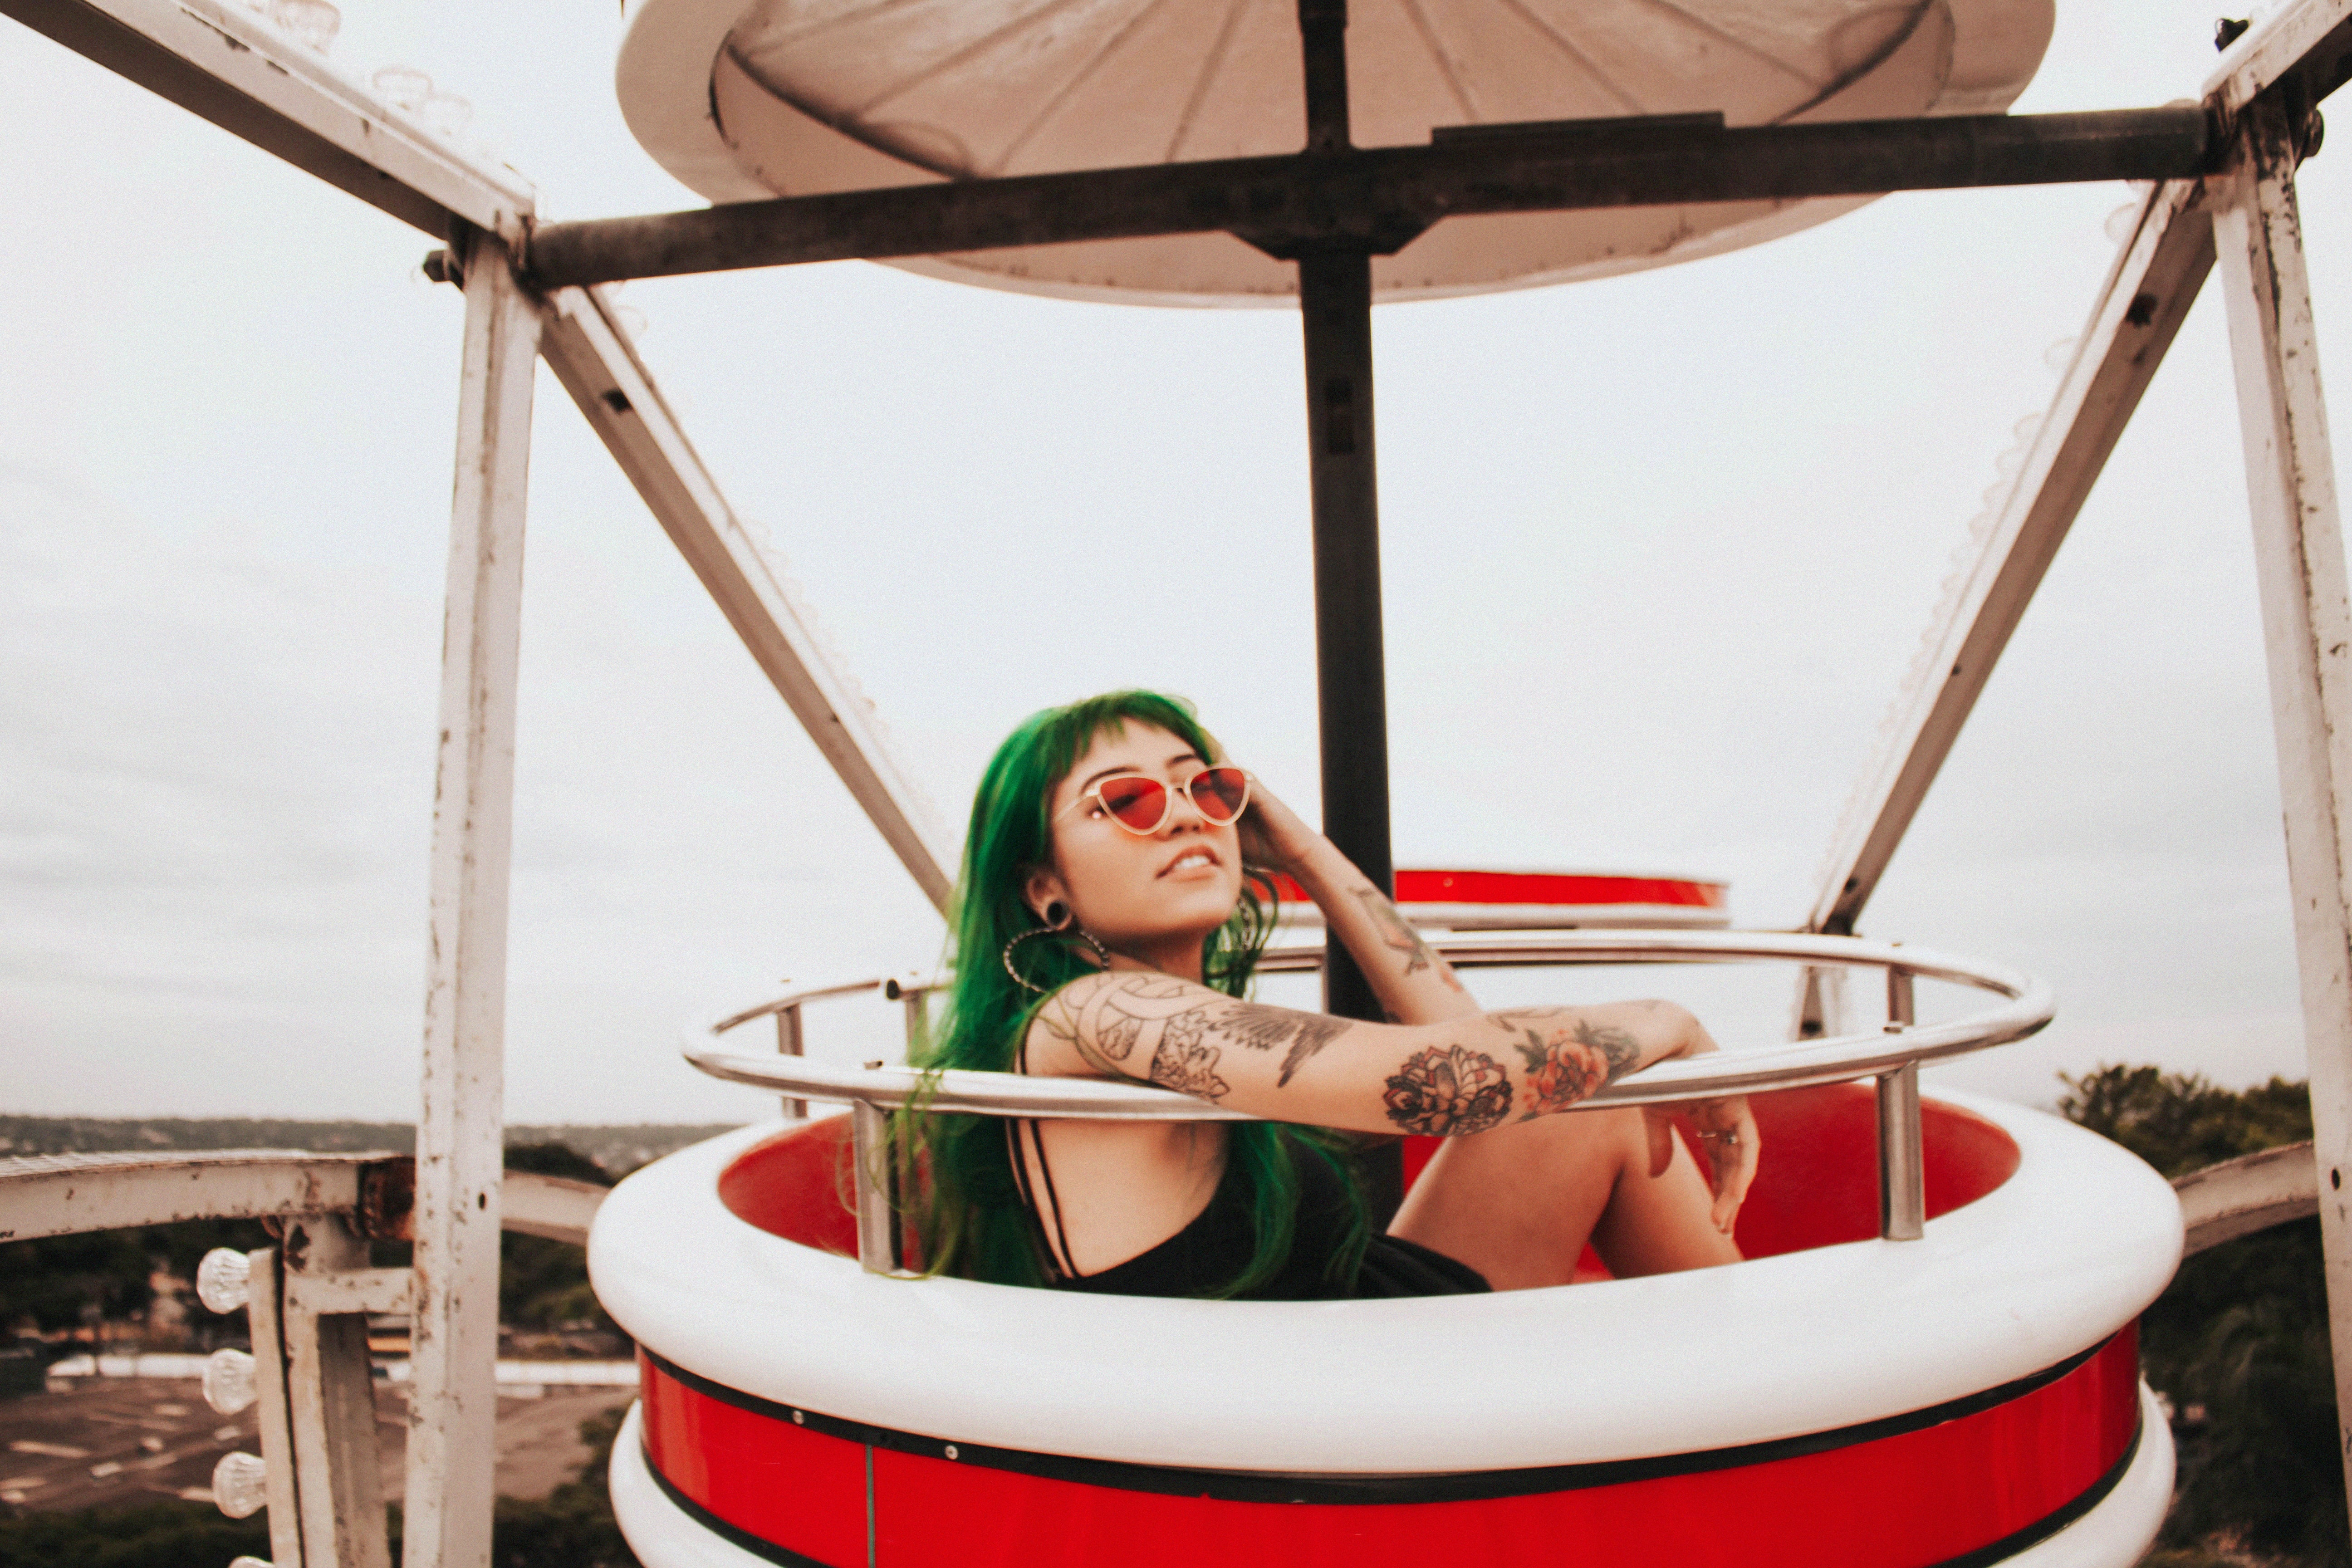 woman sitting on Ferris wheel seat